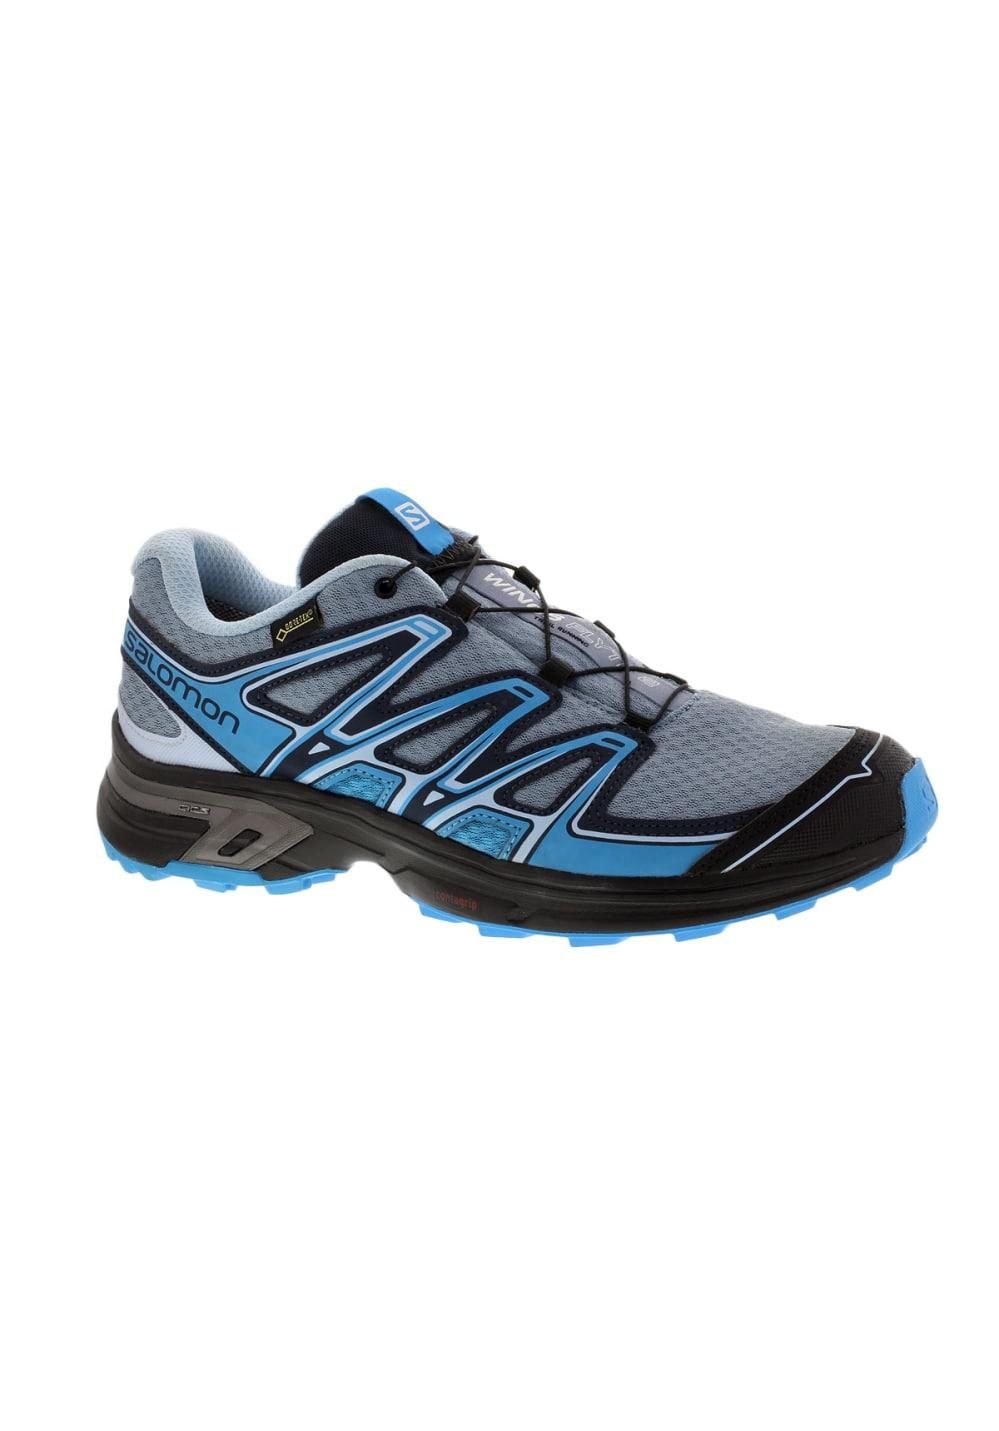 Chaussures Pour Salomon Gtx Flyte Running Wings 2 Femme Gris wnP0k8OX